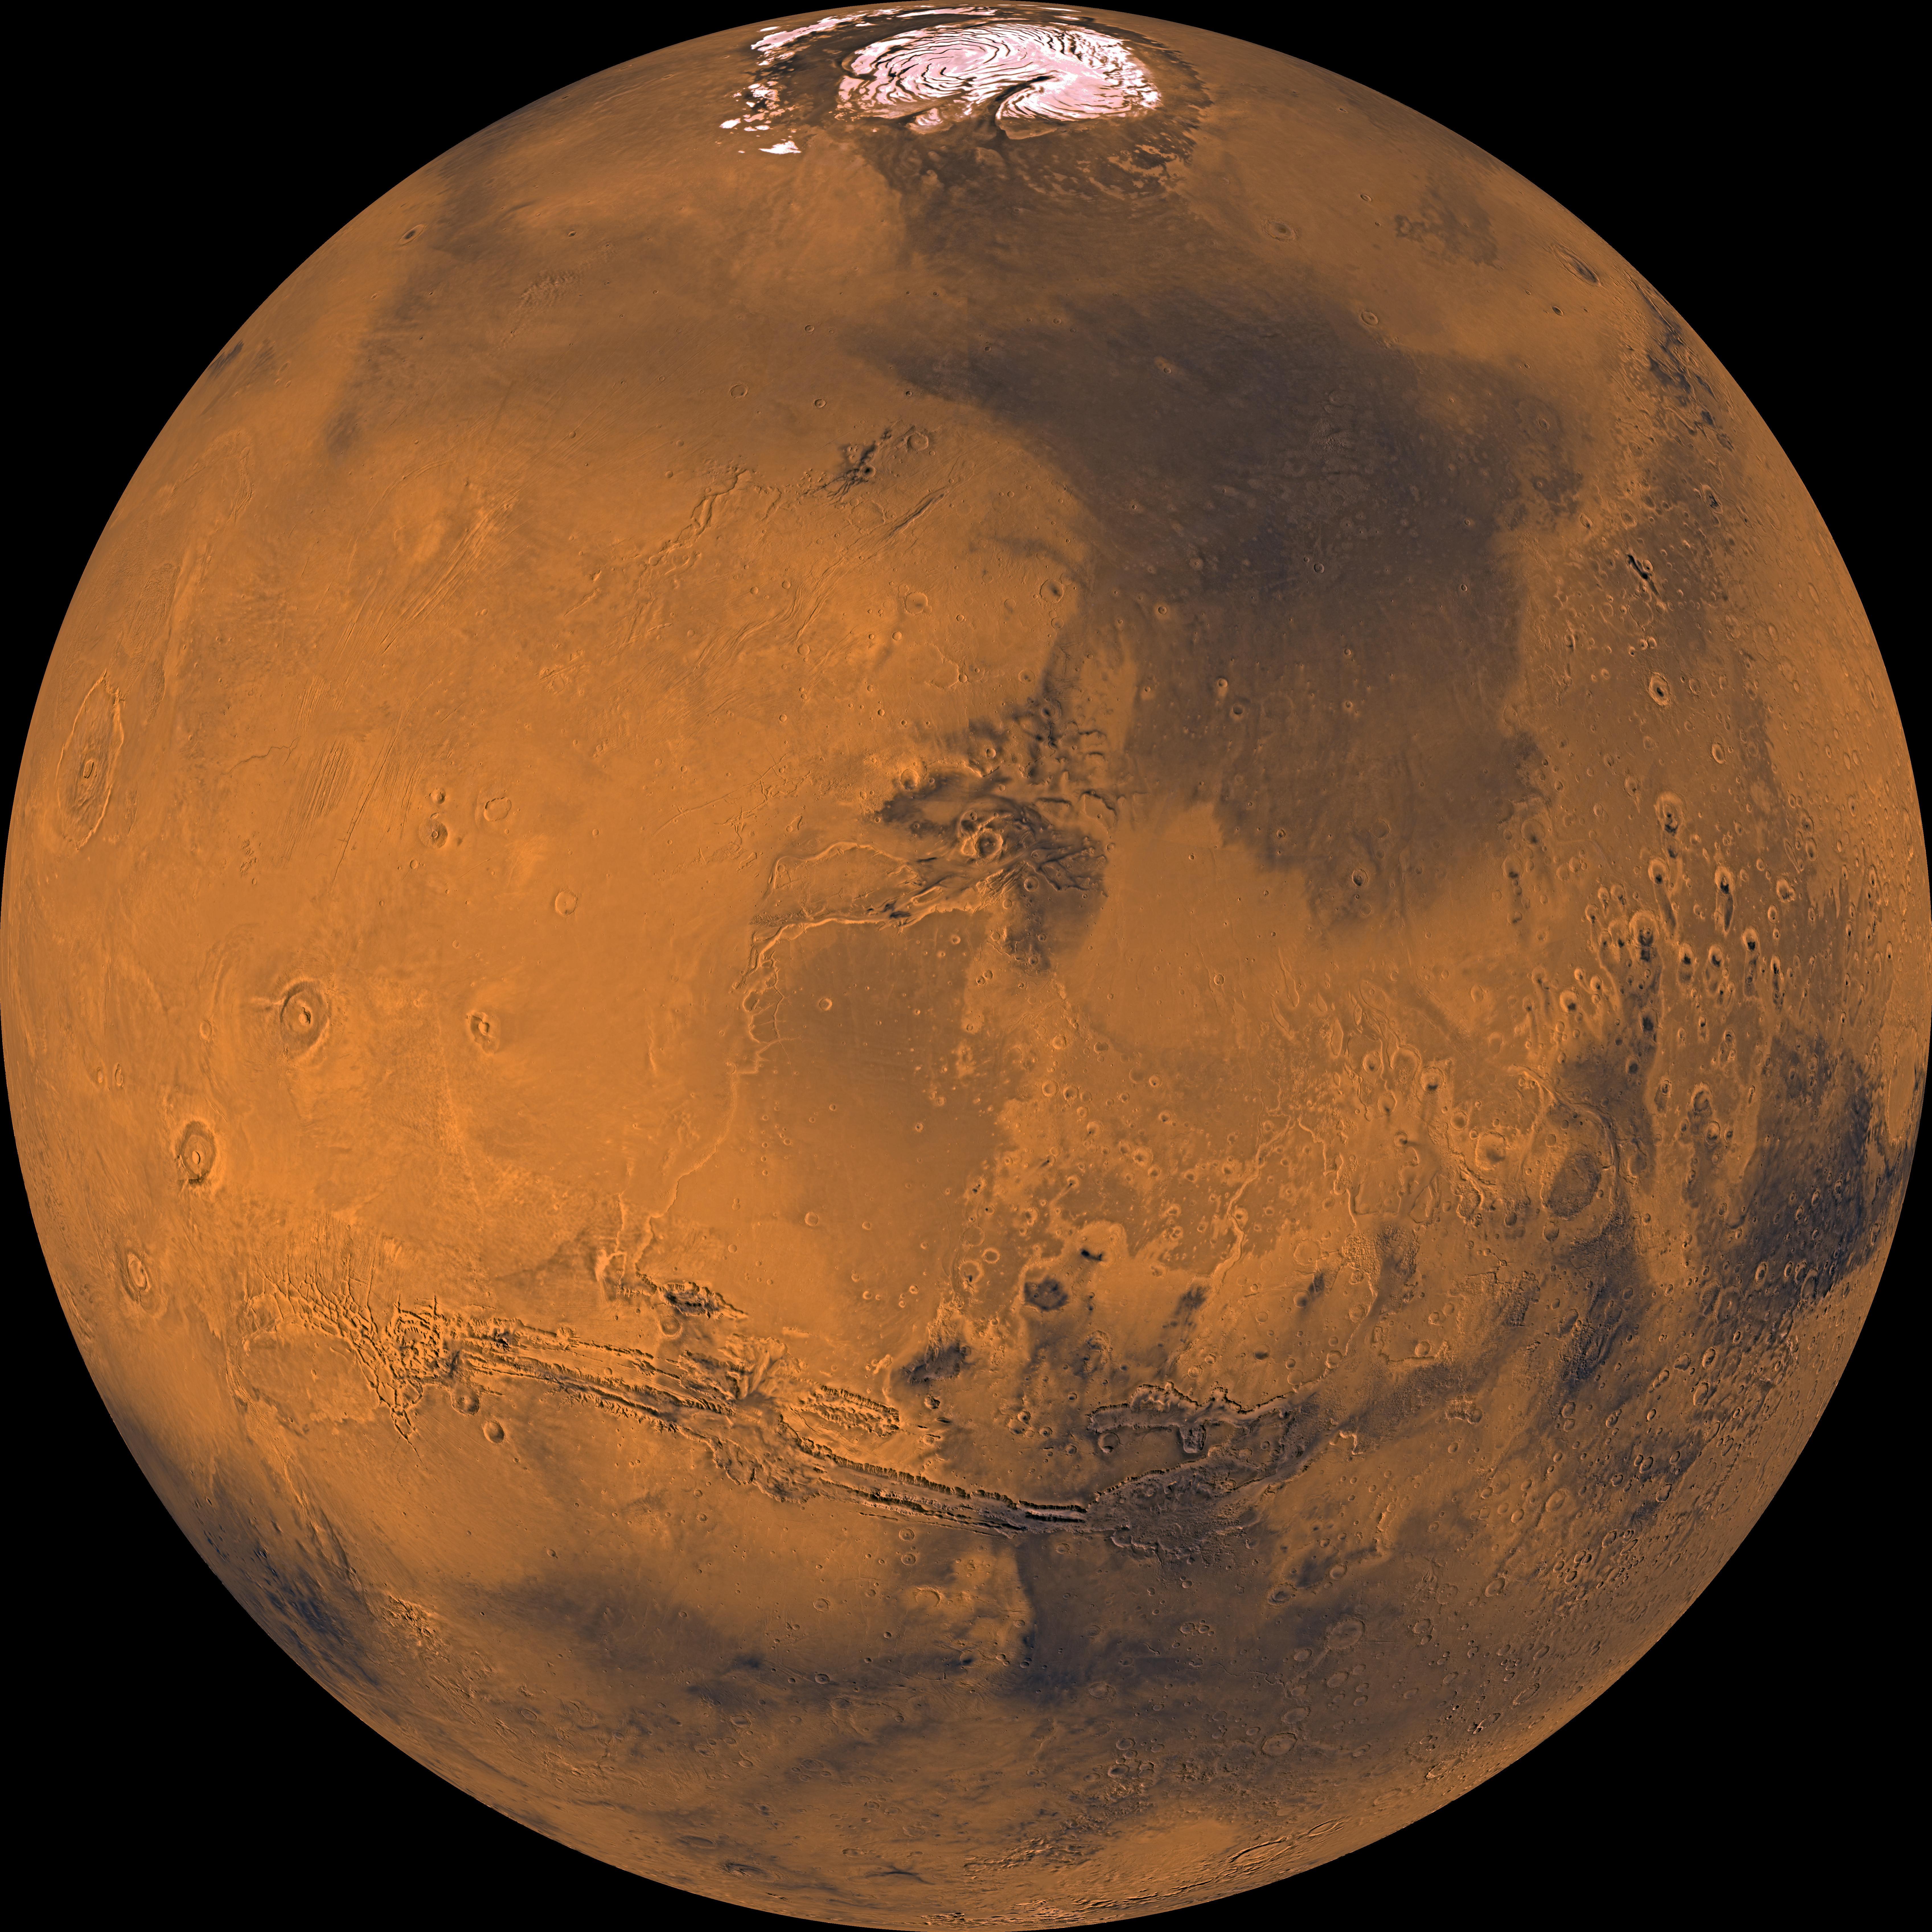 File:MARS-Viking.jpg - Wikimedia Commons